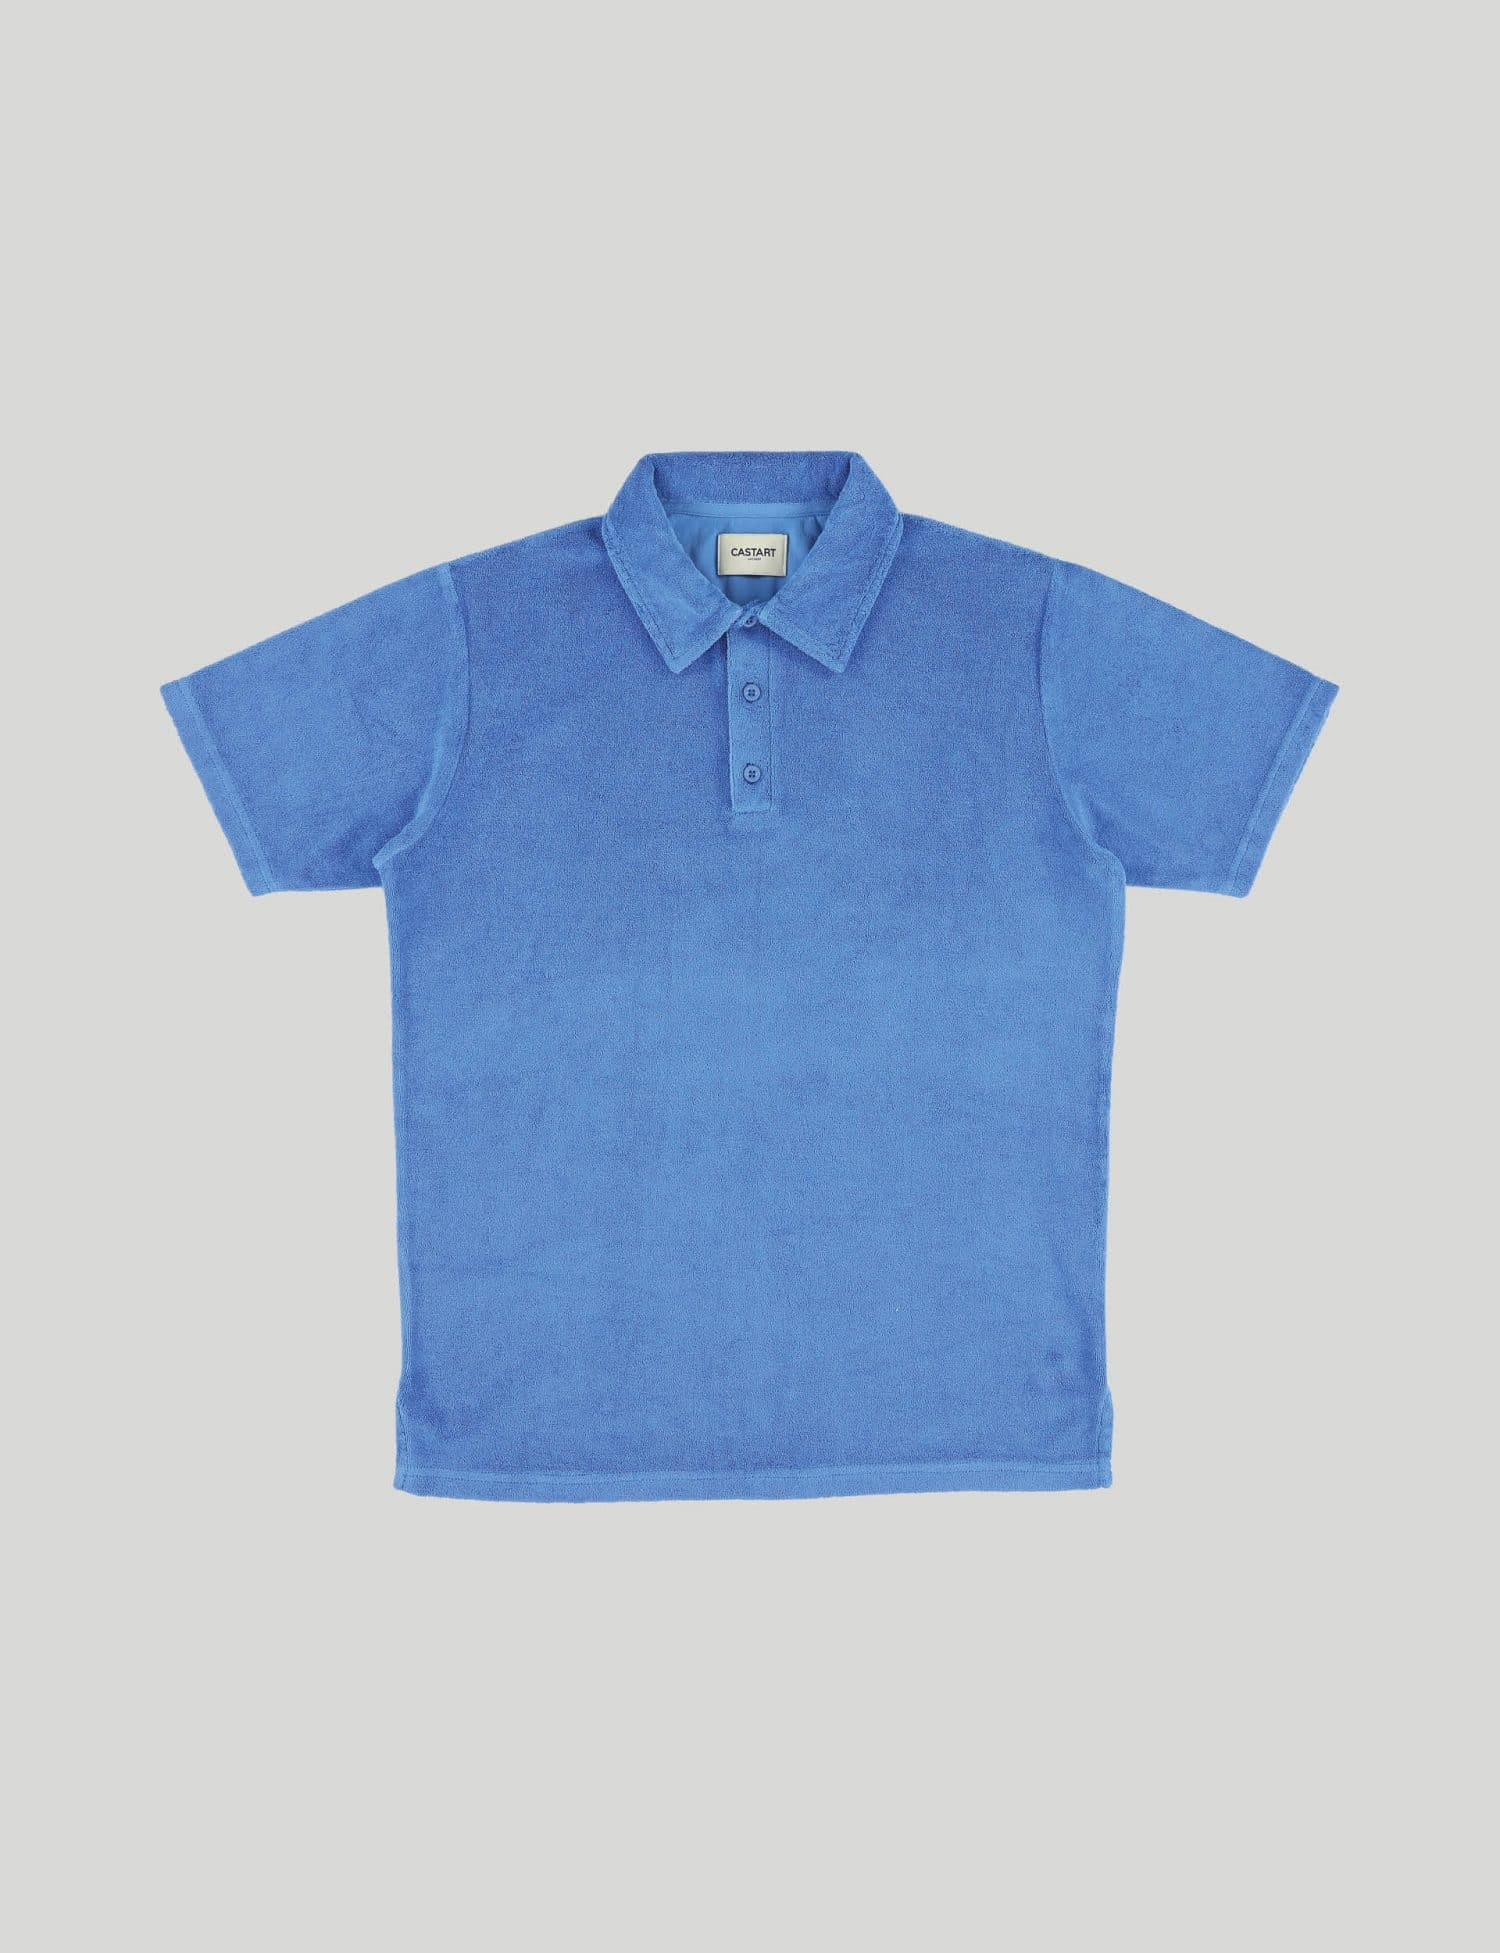 Castart - Seaford polo tee - French Blue